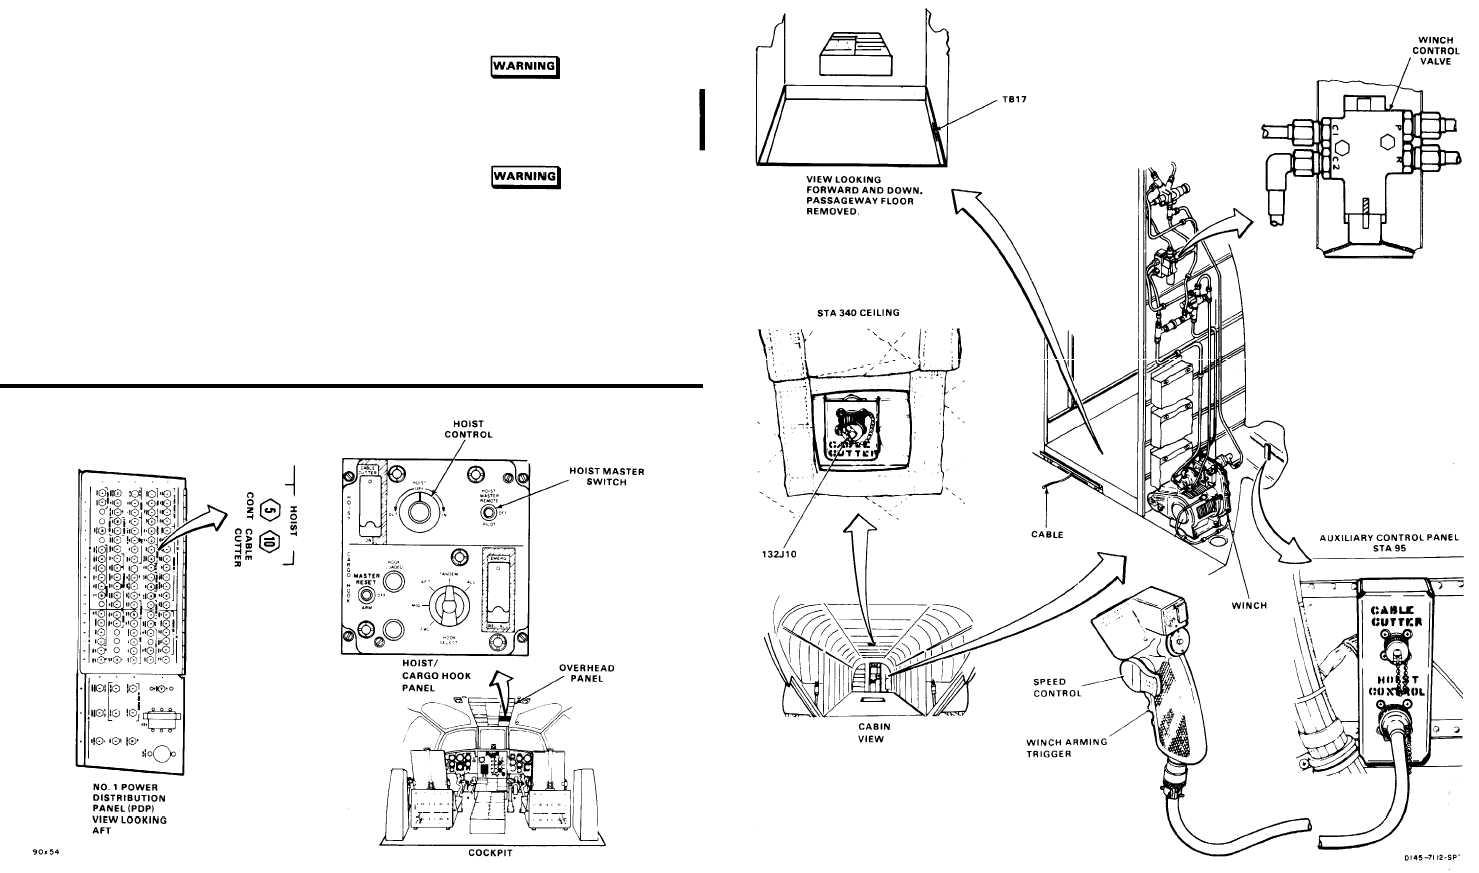 T40 Hook Lift Wiring Diagram